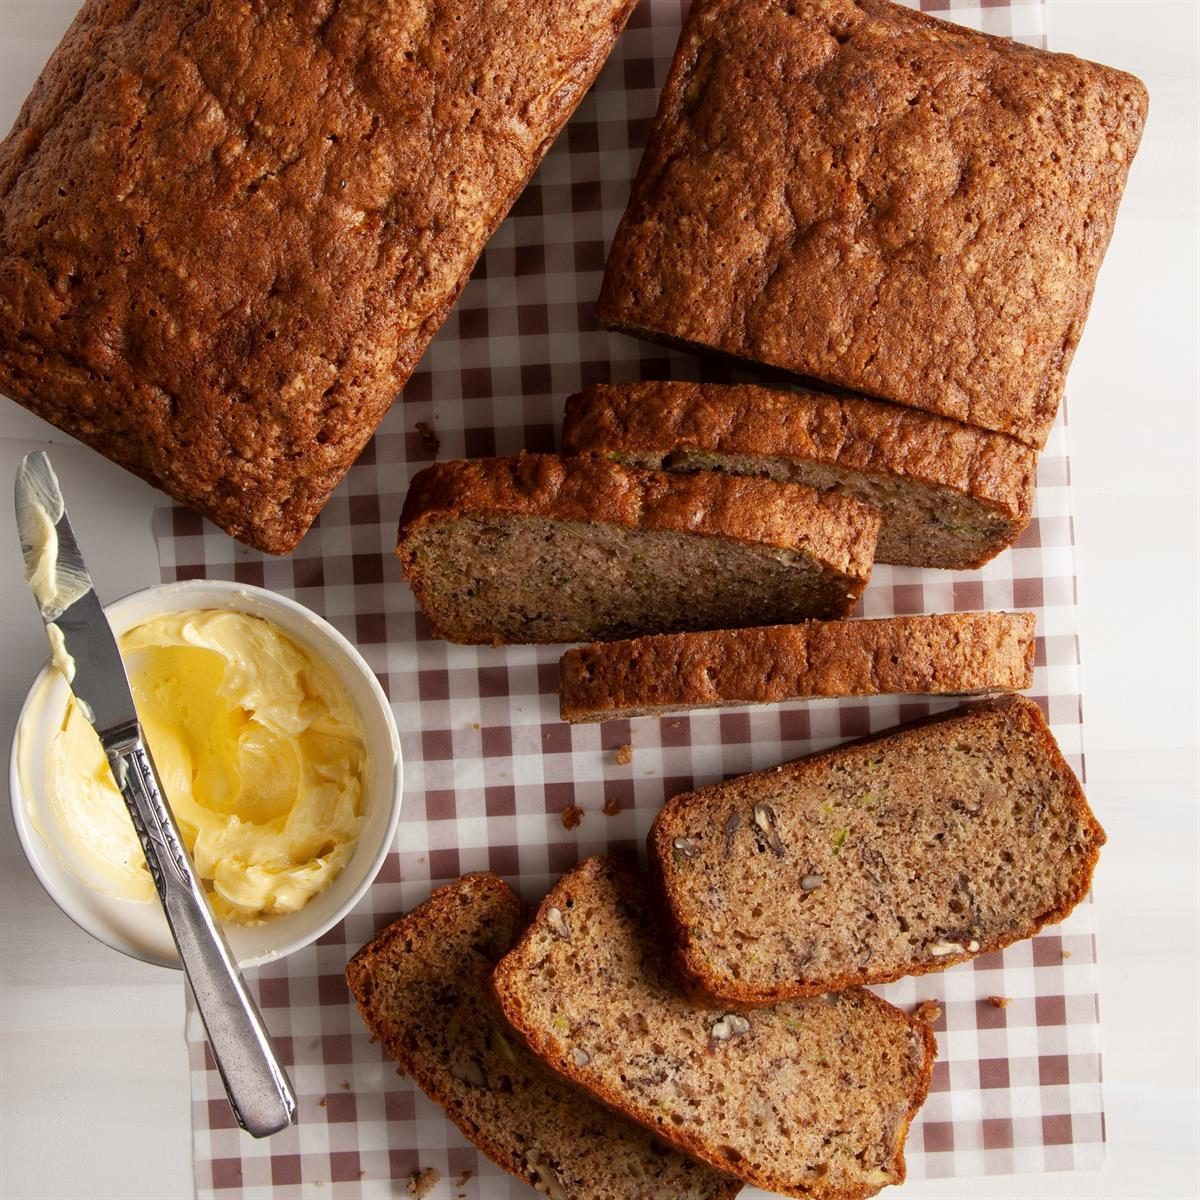 Banana-Zucchini Bread